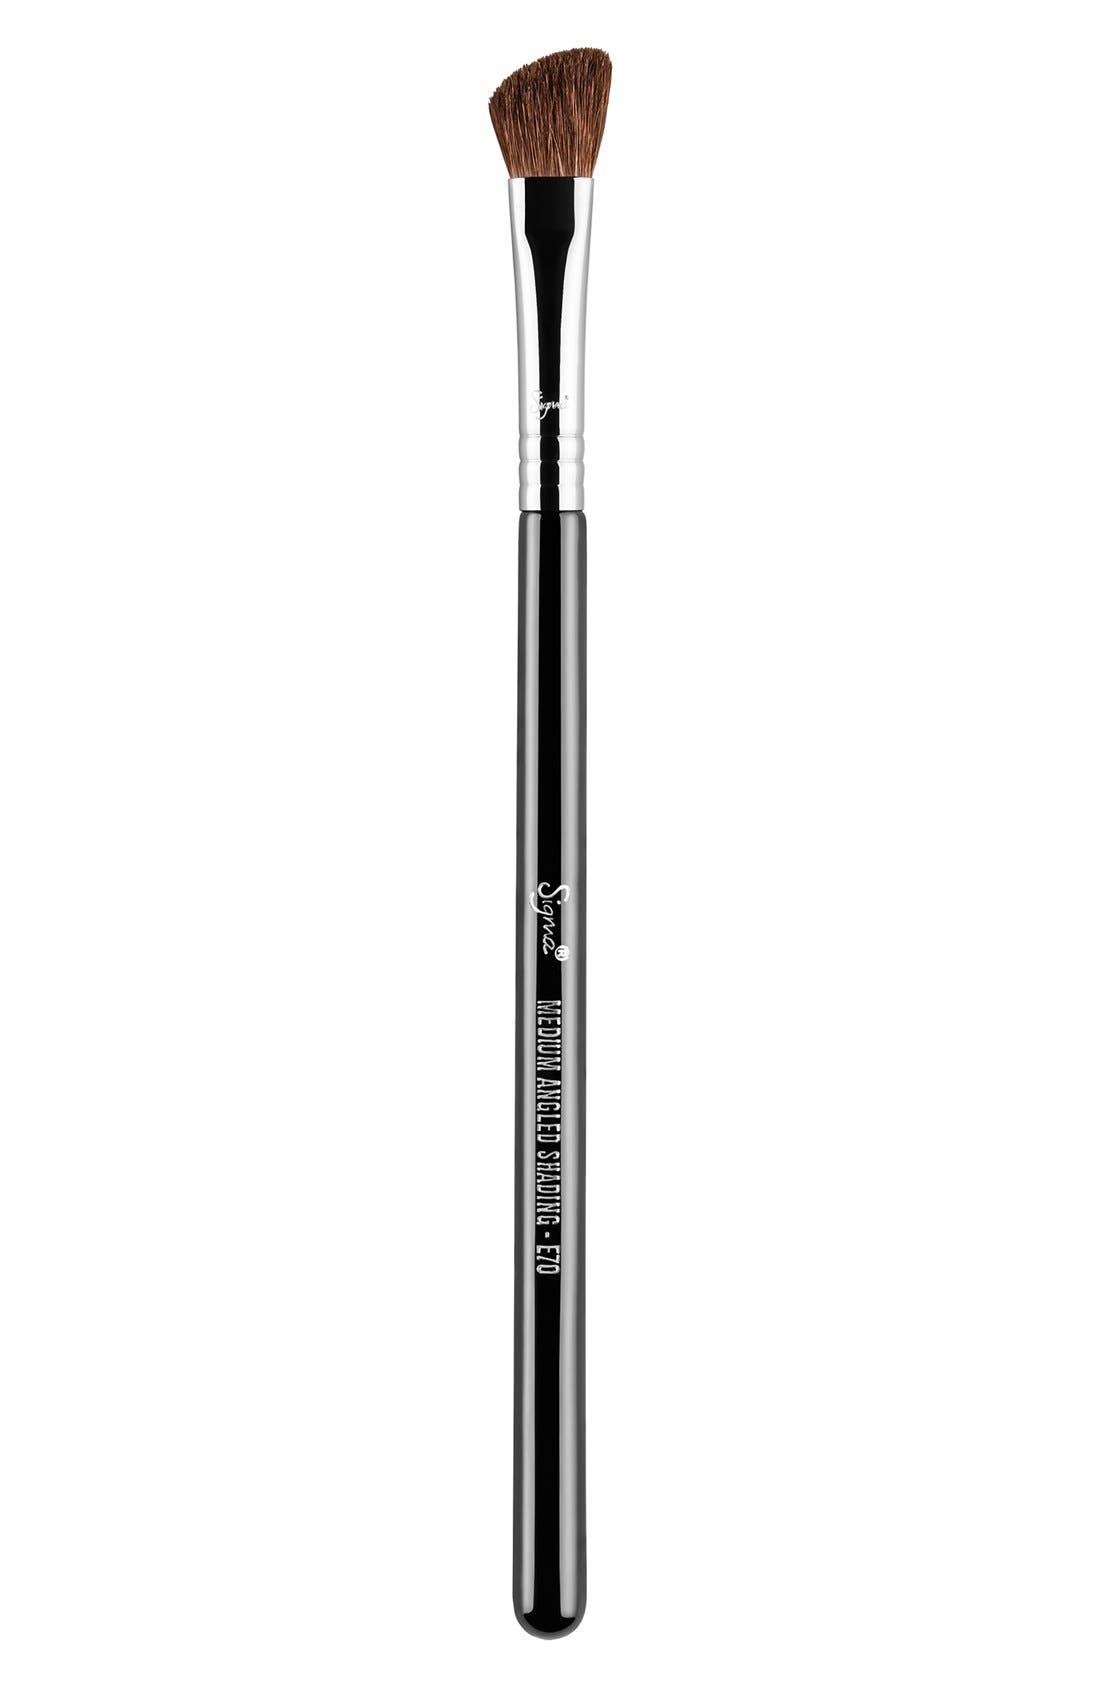 E70 Medium Angled Shading Brush,                         Main,                         color, NO COLOR